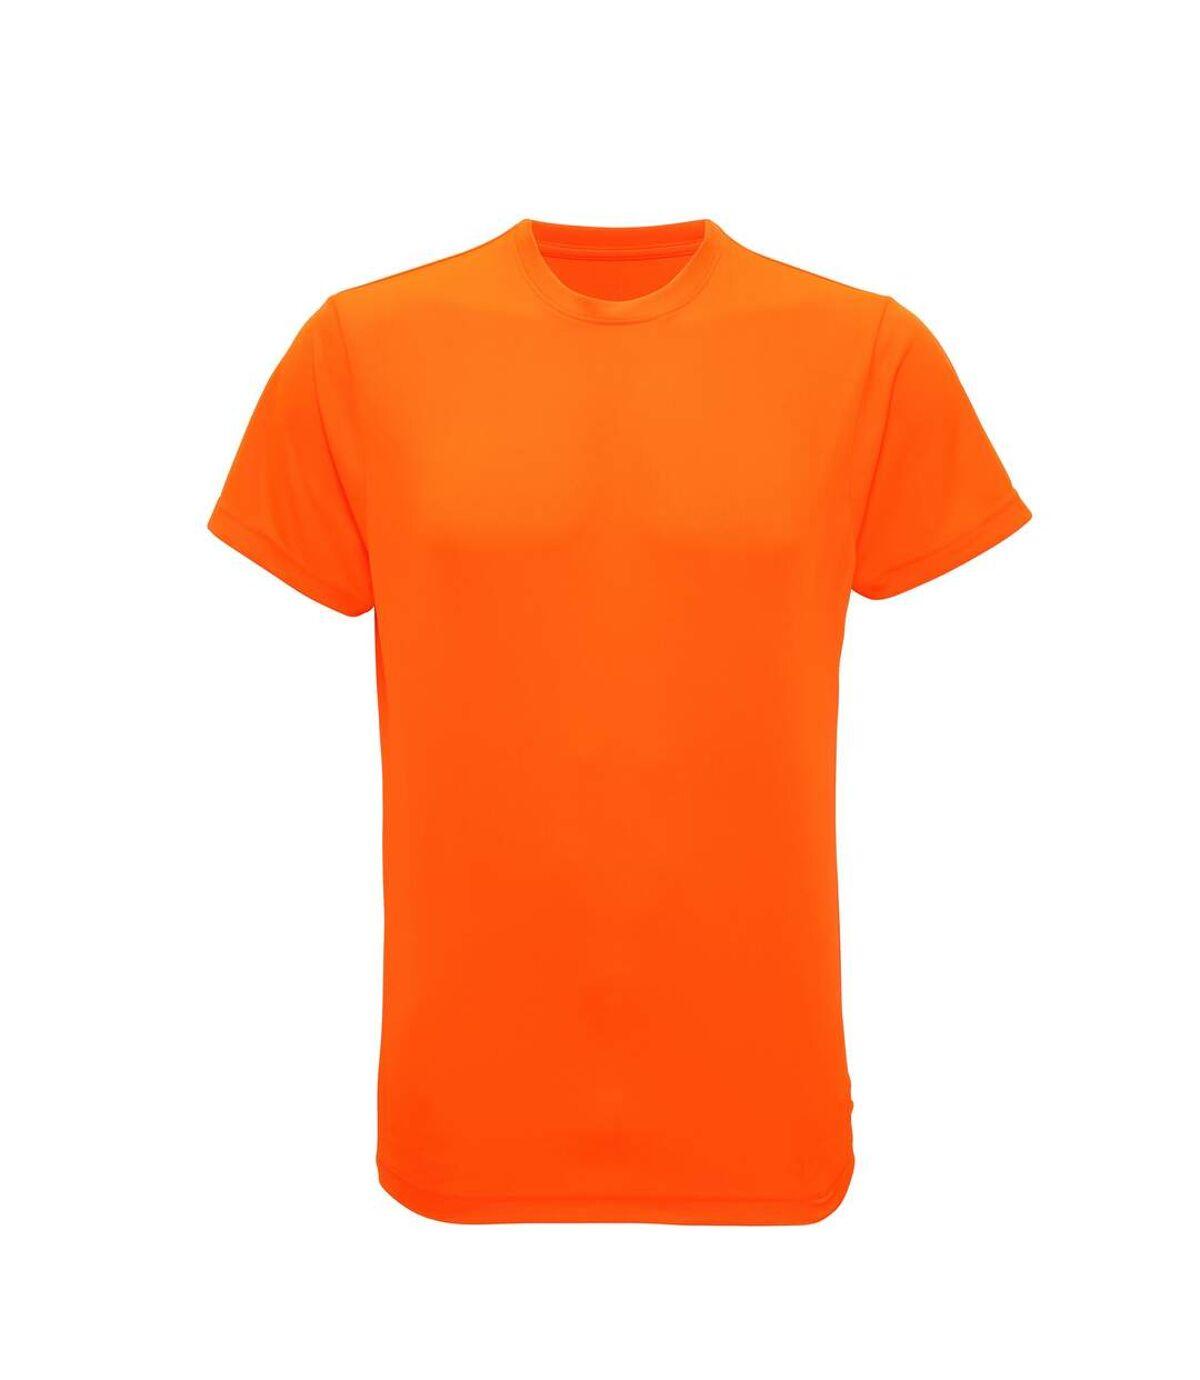 Tri Dri Mens Short Sleeve Lightweight Fitness T-Shirt (Sun Yellow) - UTRW4798